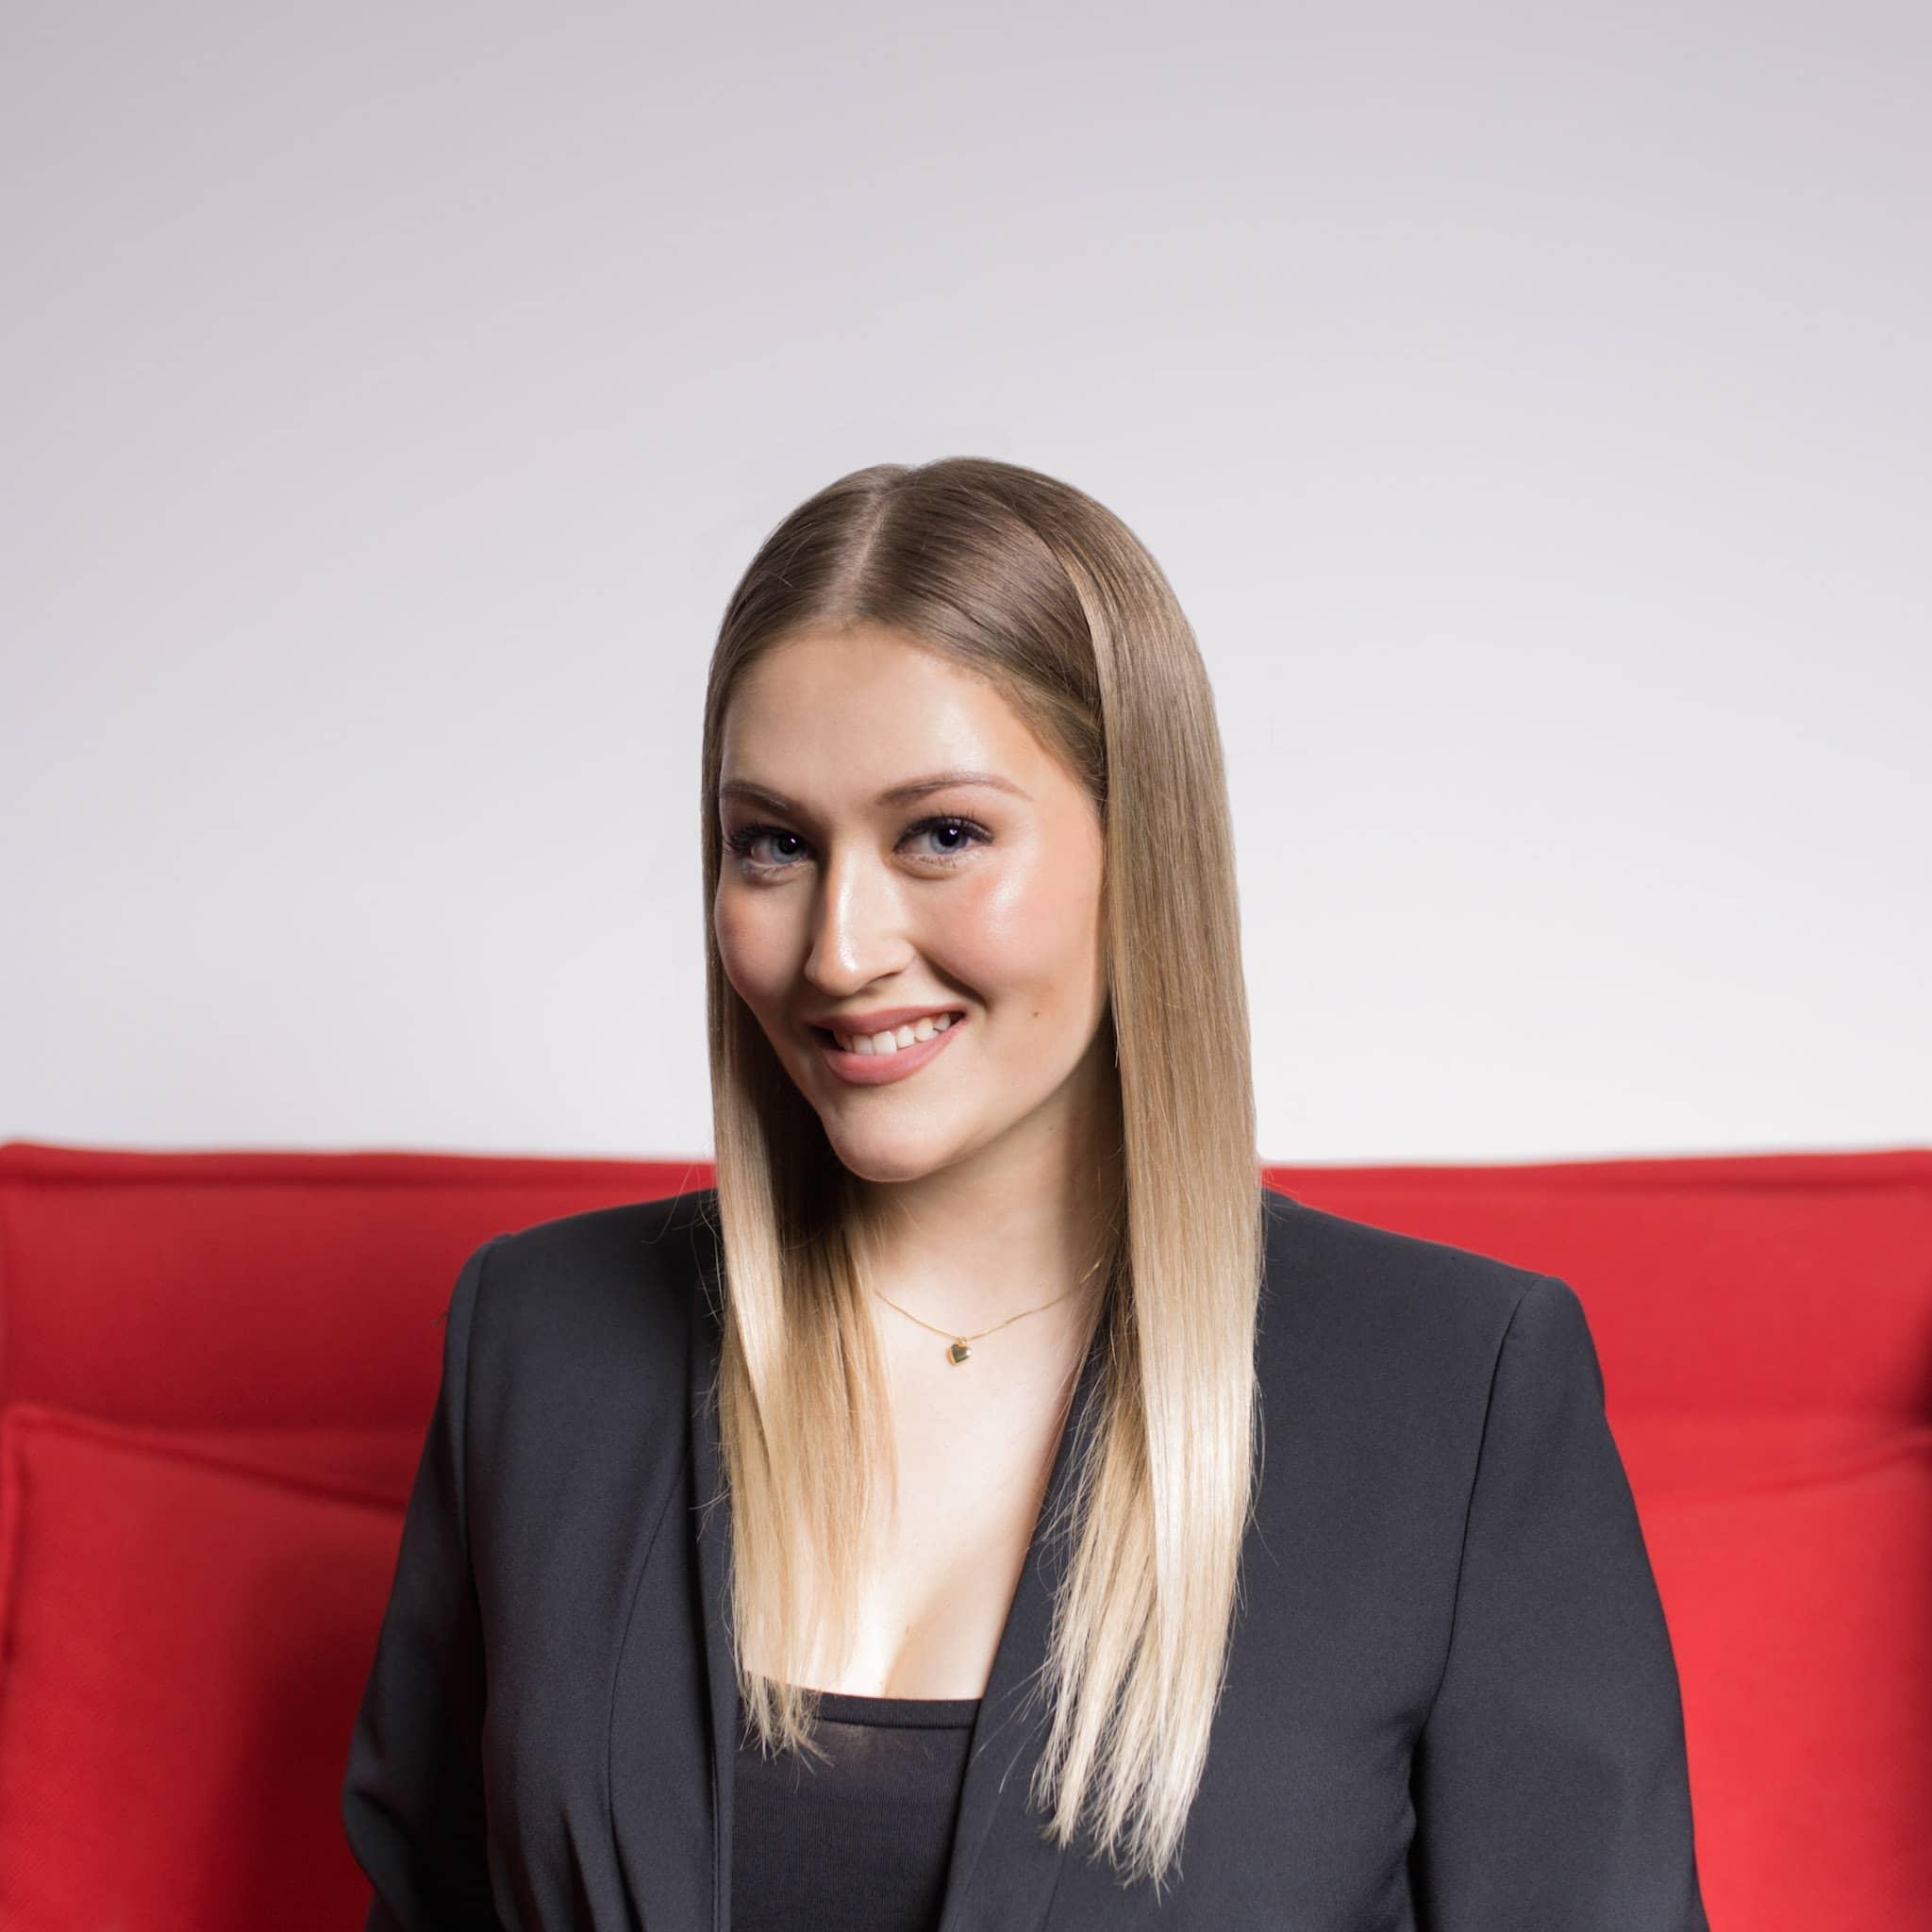 Bianca Laube - Personalberaterin der KDS Personalberatung